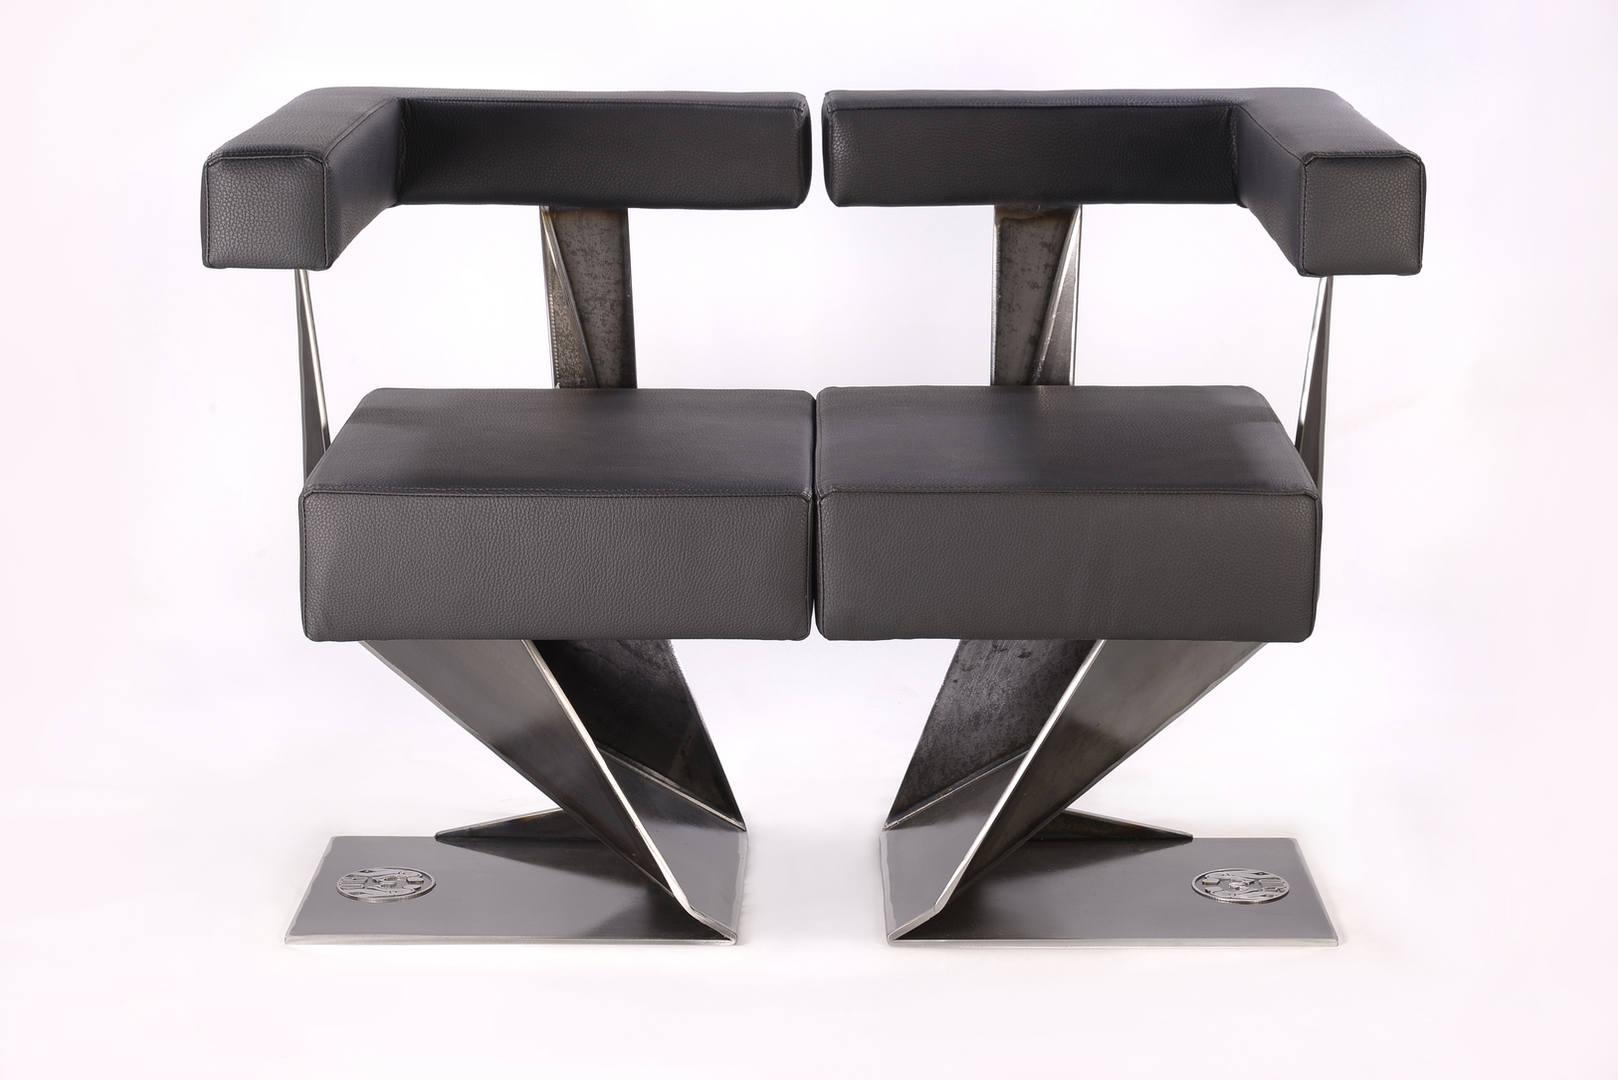 Geometik-L Stuhl-Modular-Steelware Desig